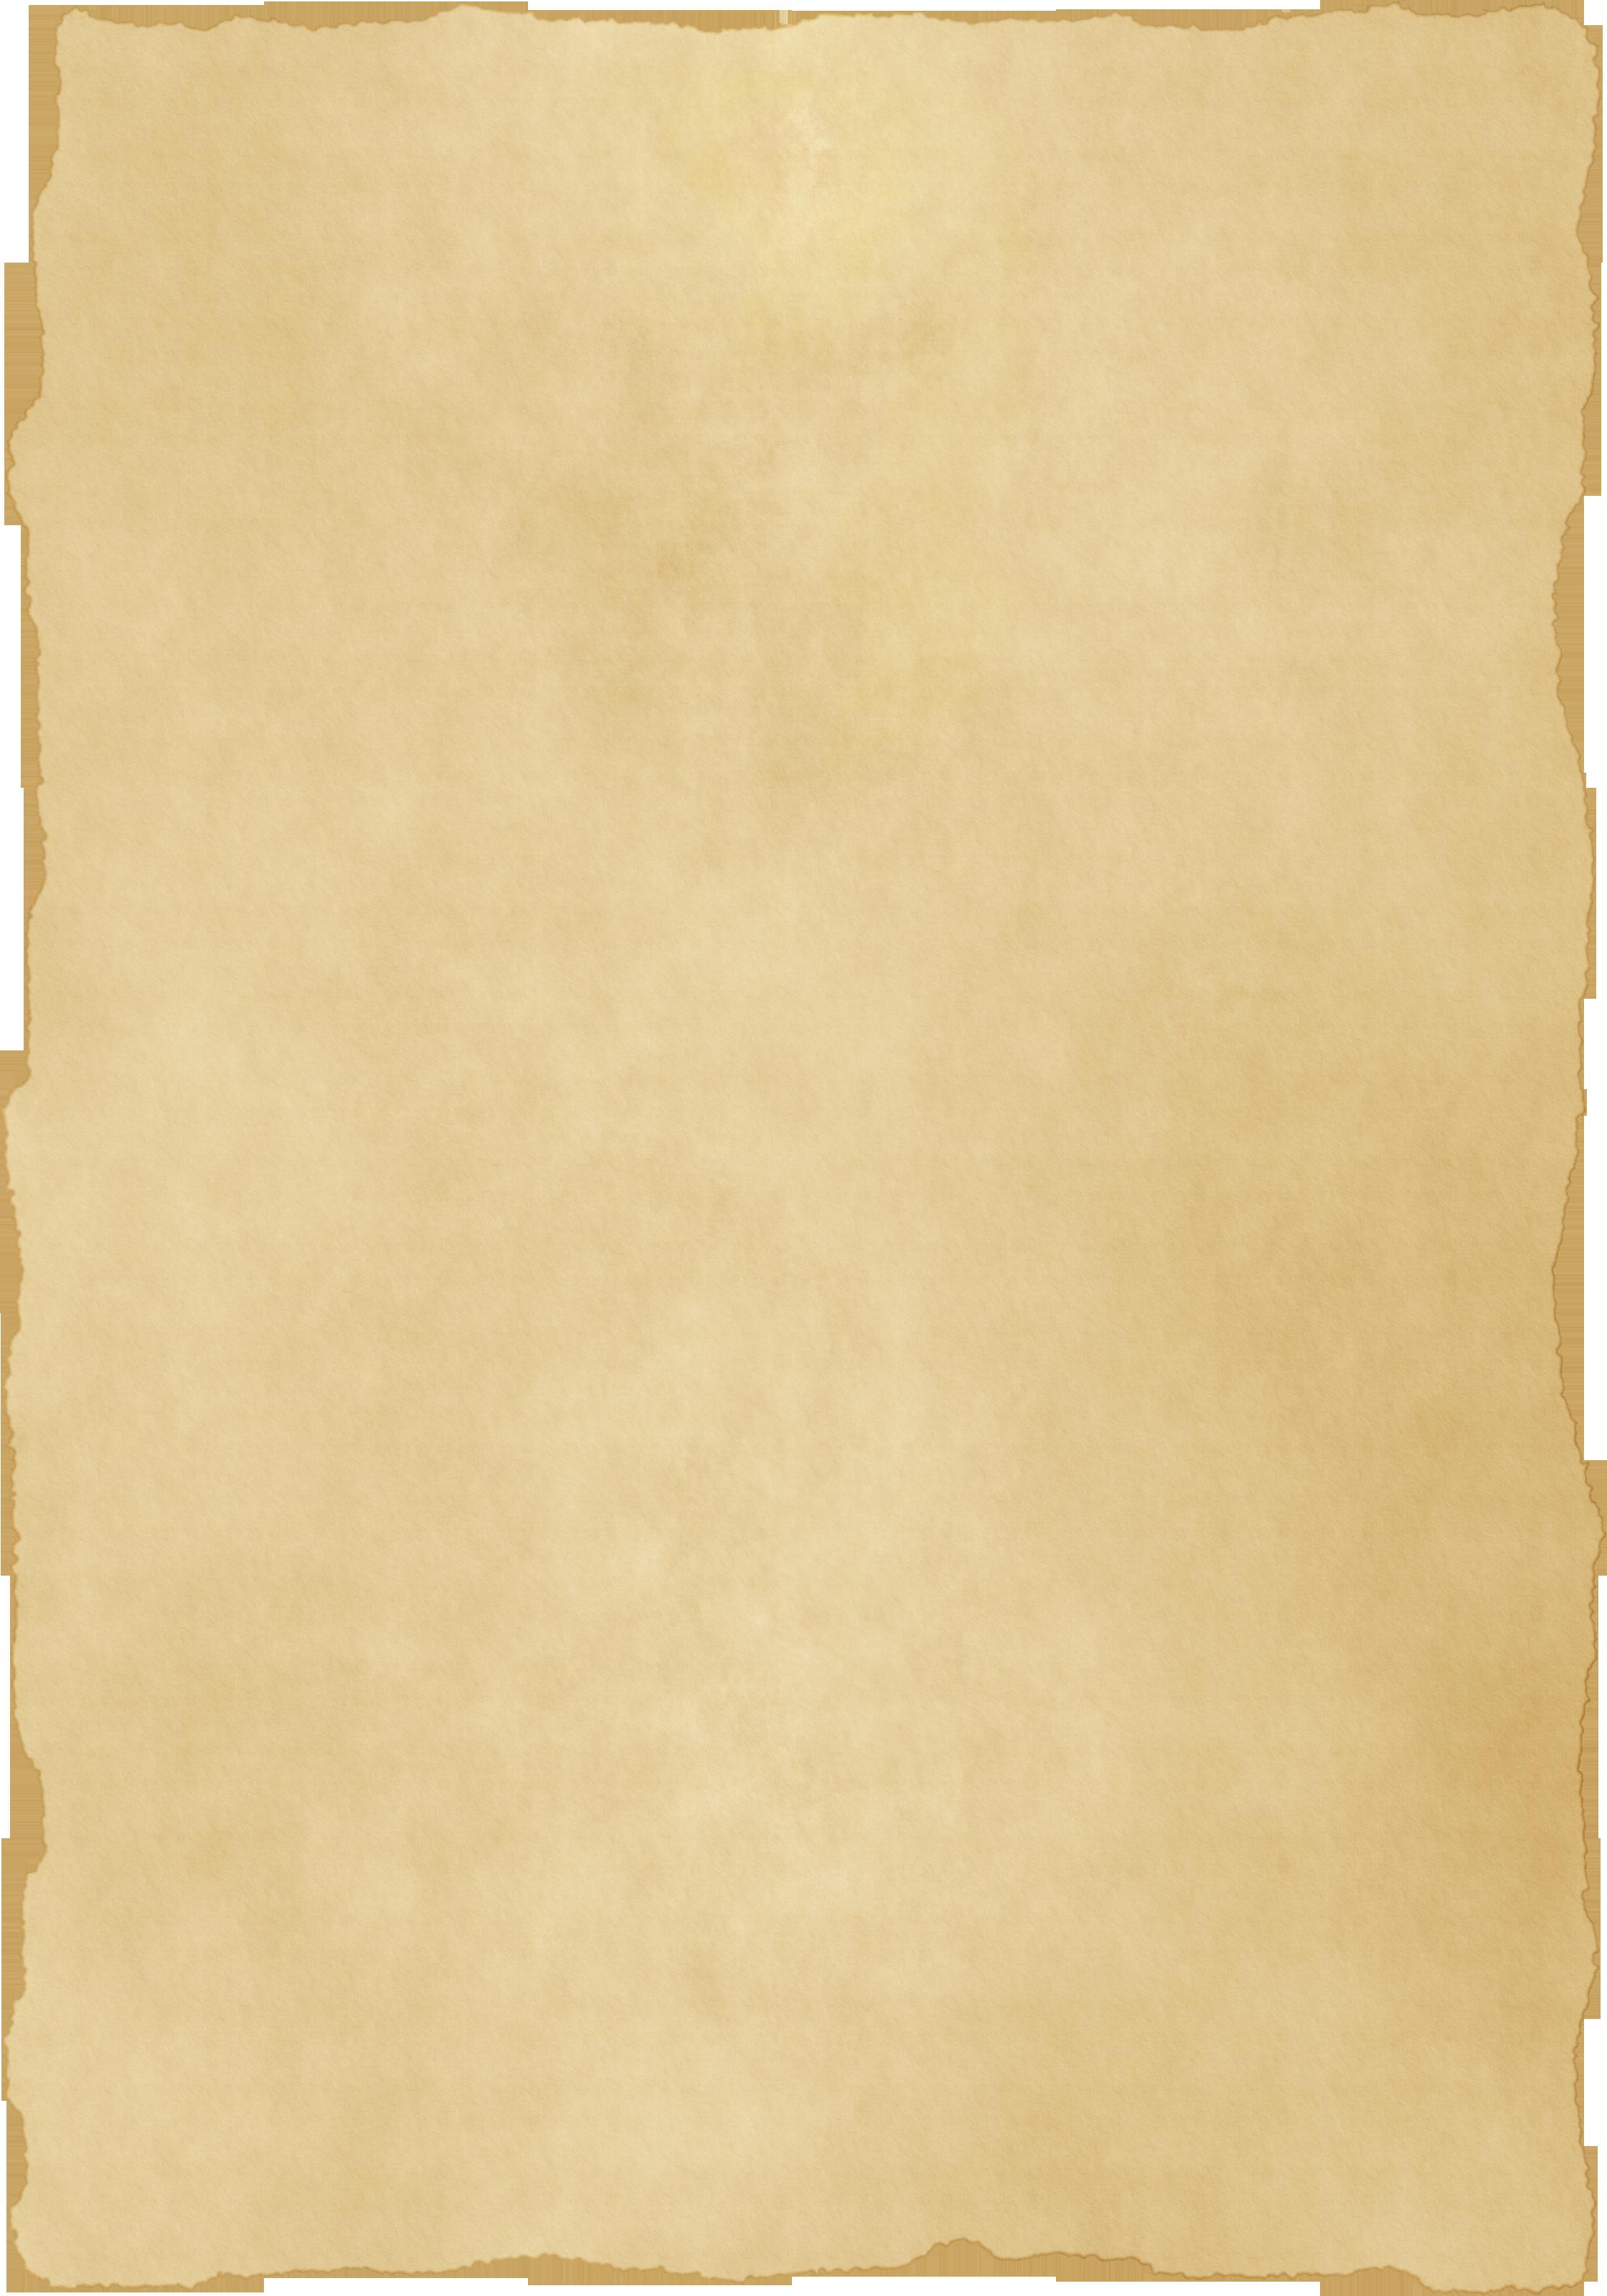 Paper Sheet PNG - 13469